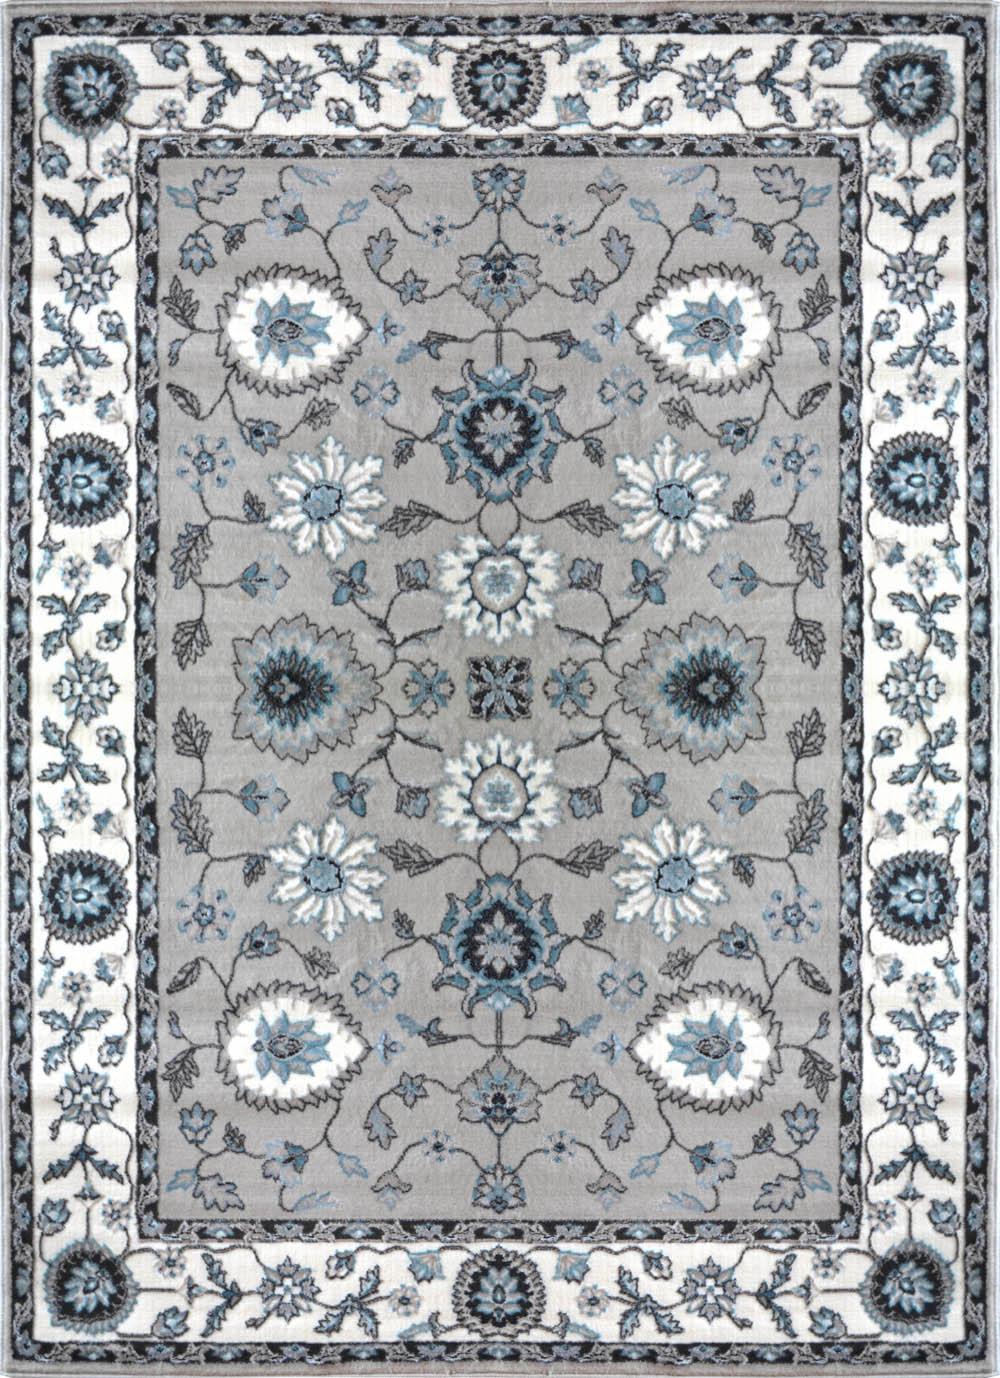 Traditional Beige Cream Carpet Petals Scrolls Floral Vines